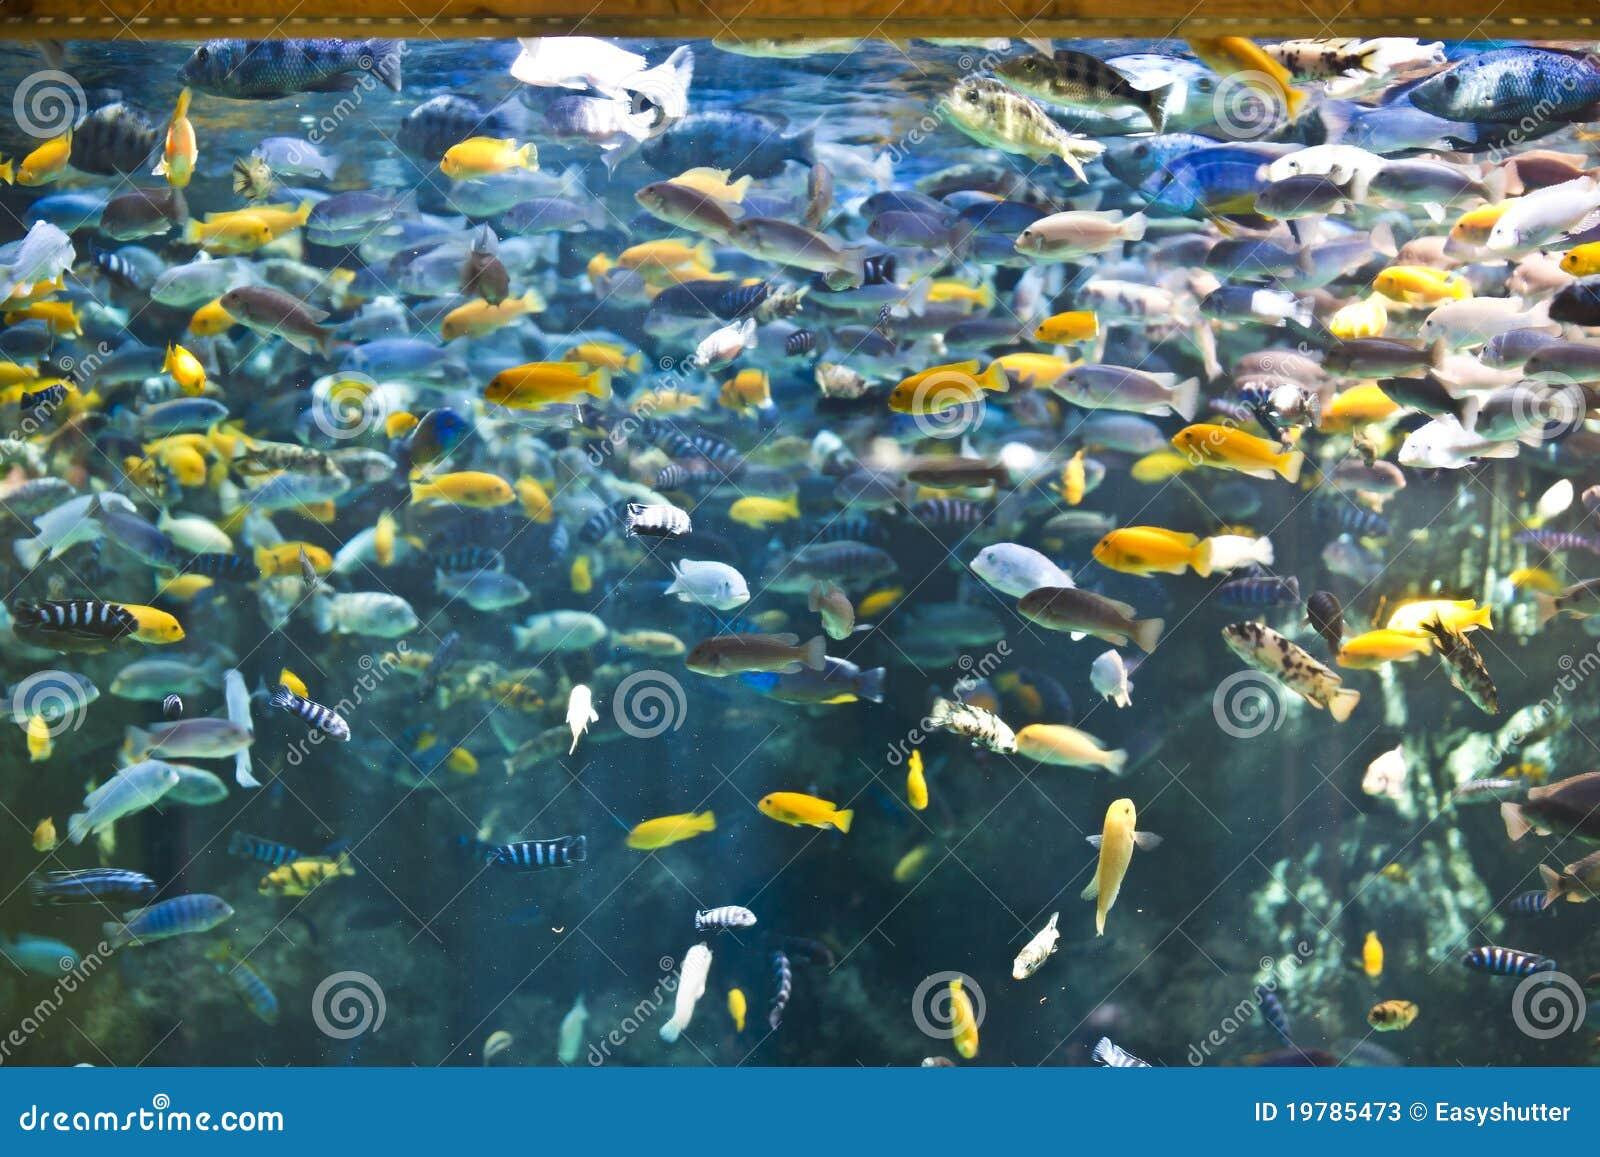 Fish tank stock photos image 19785473 for Dream of fish tank